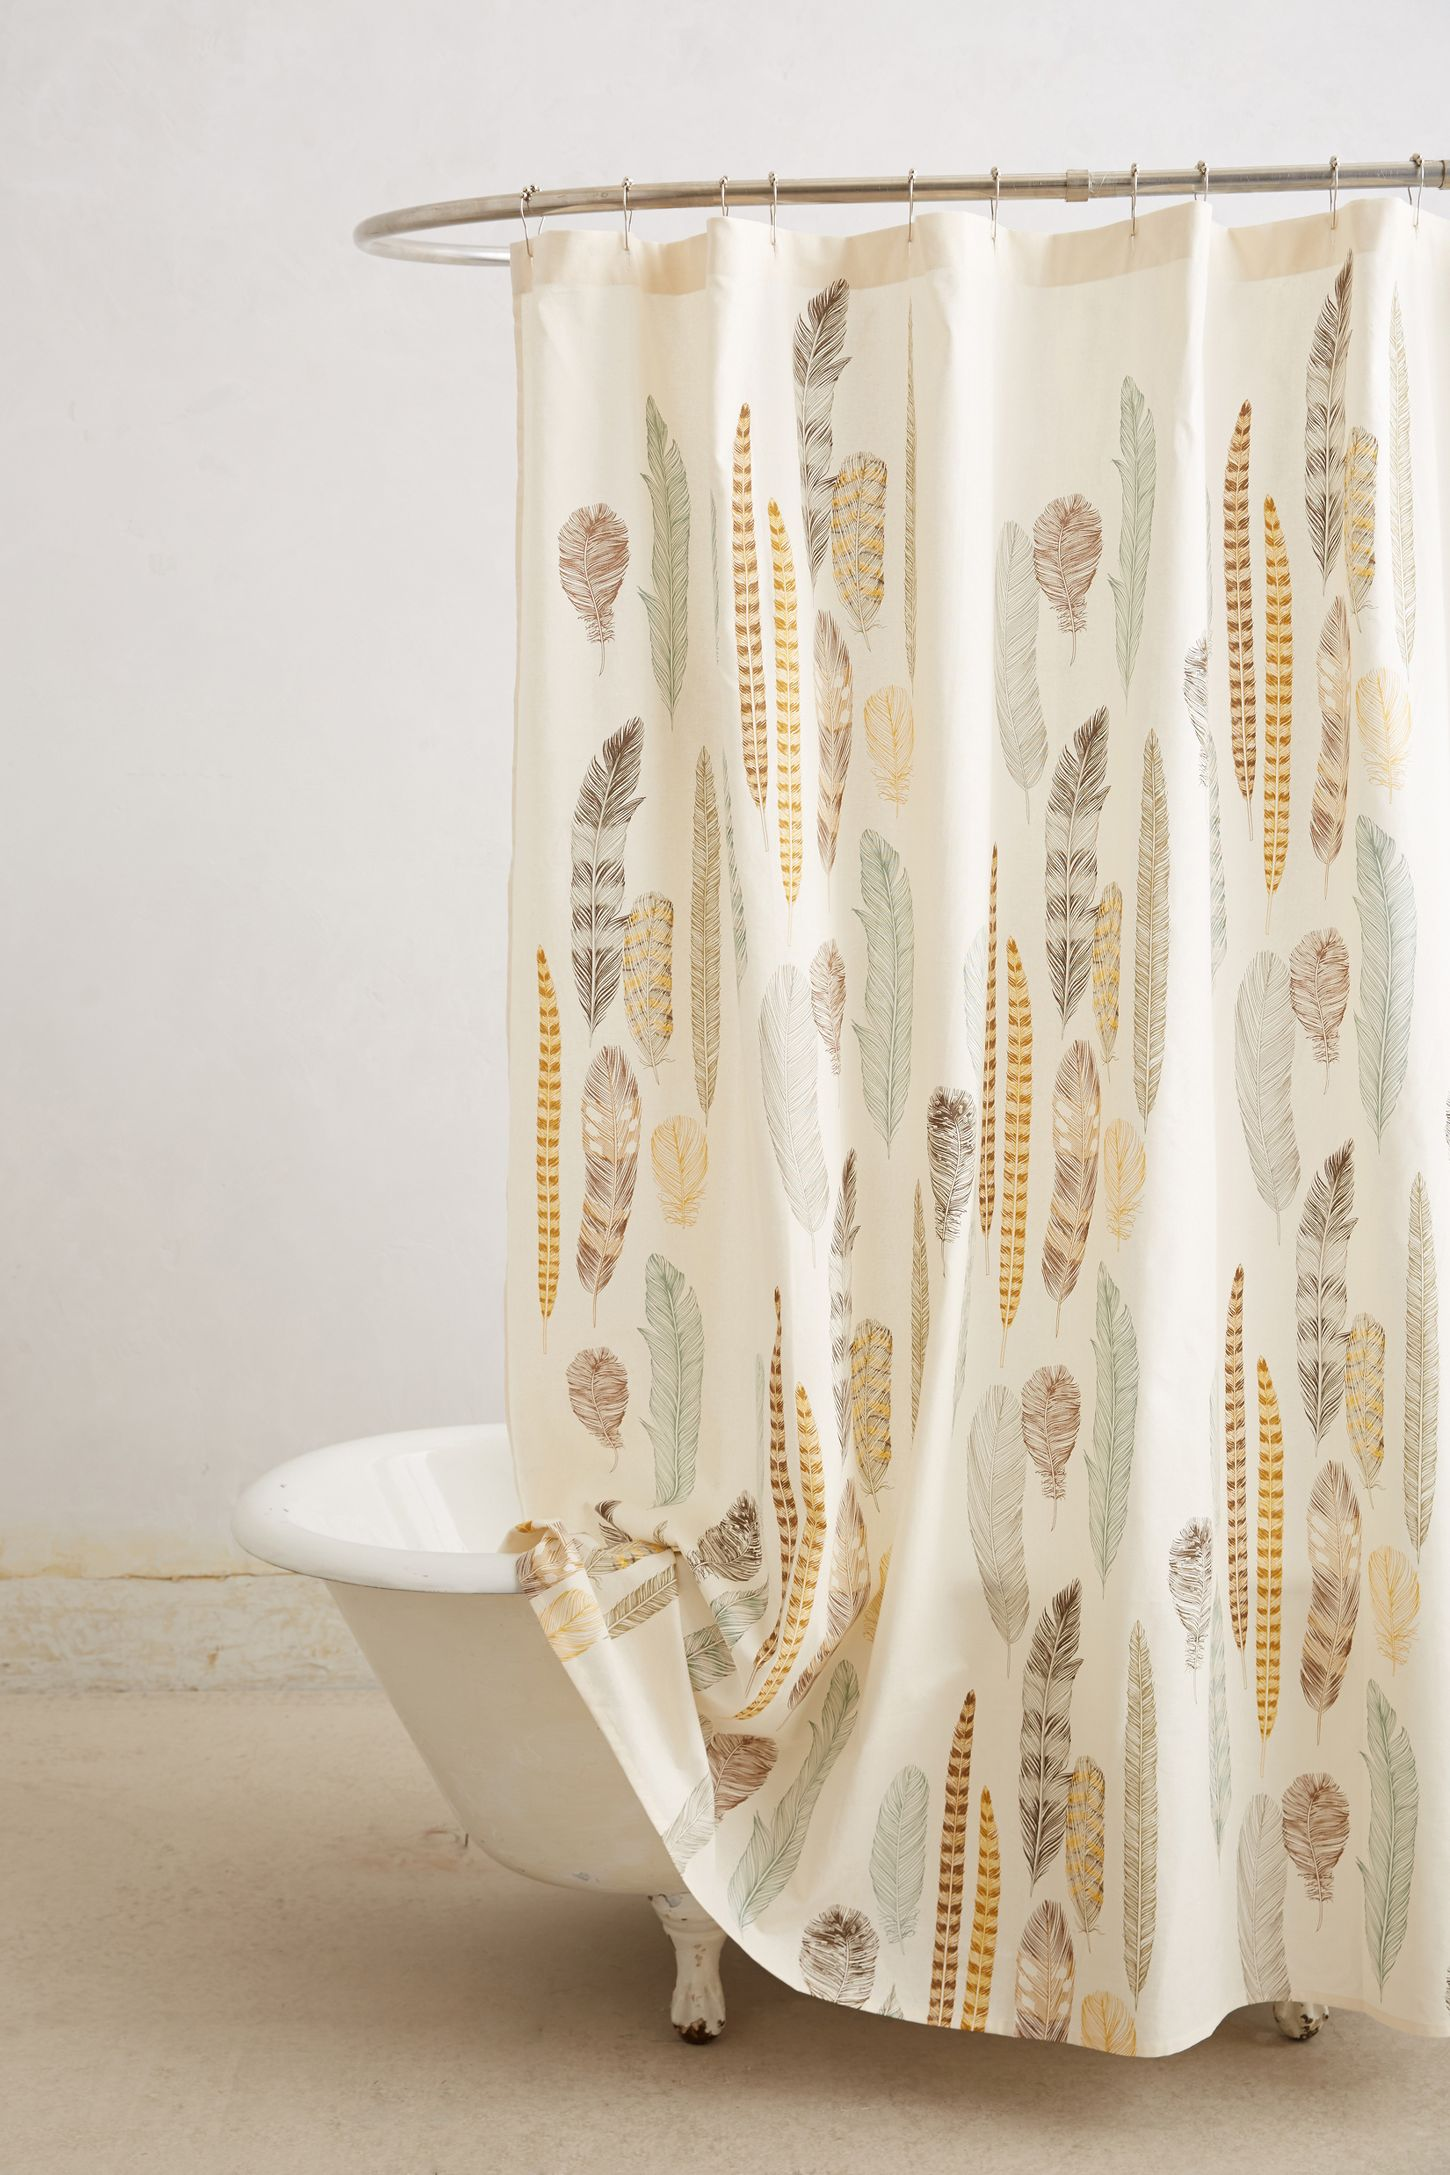 Anthropologie floral shower curtain - Anthropologie Floral Shower Curtain 25